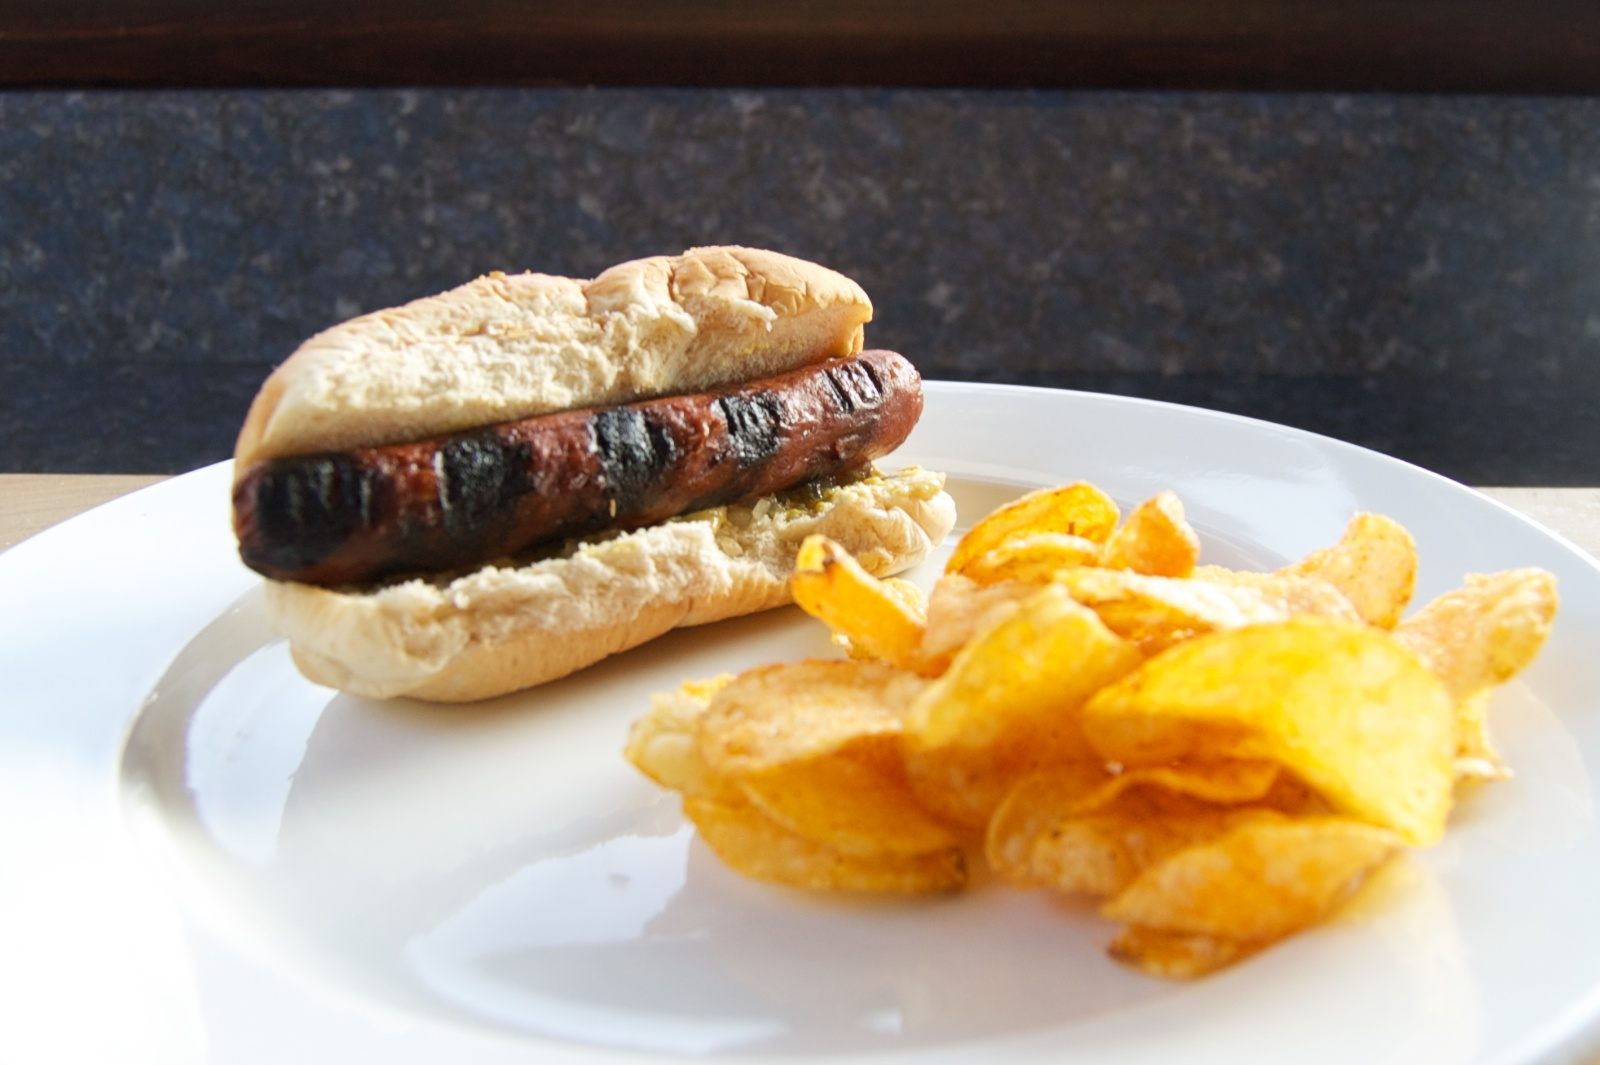 http://blog.rickk.com/food/2013/03/11/ate.2013.03.10.l.jpg